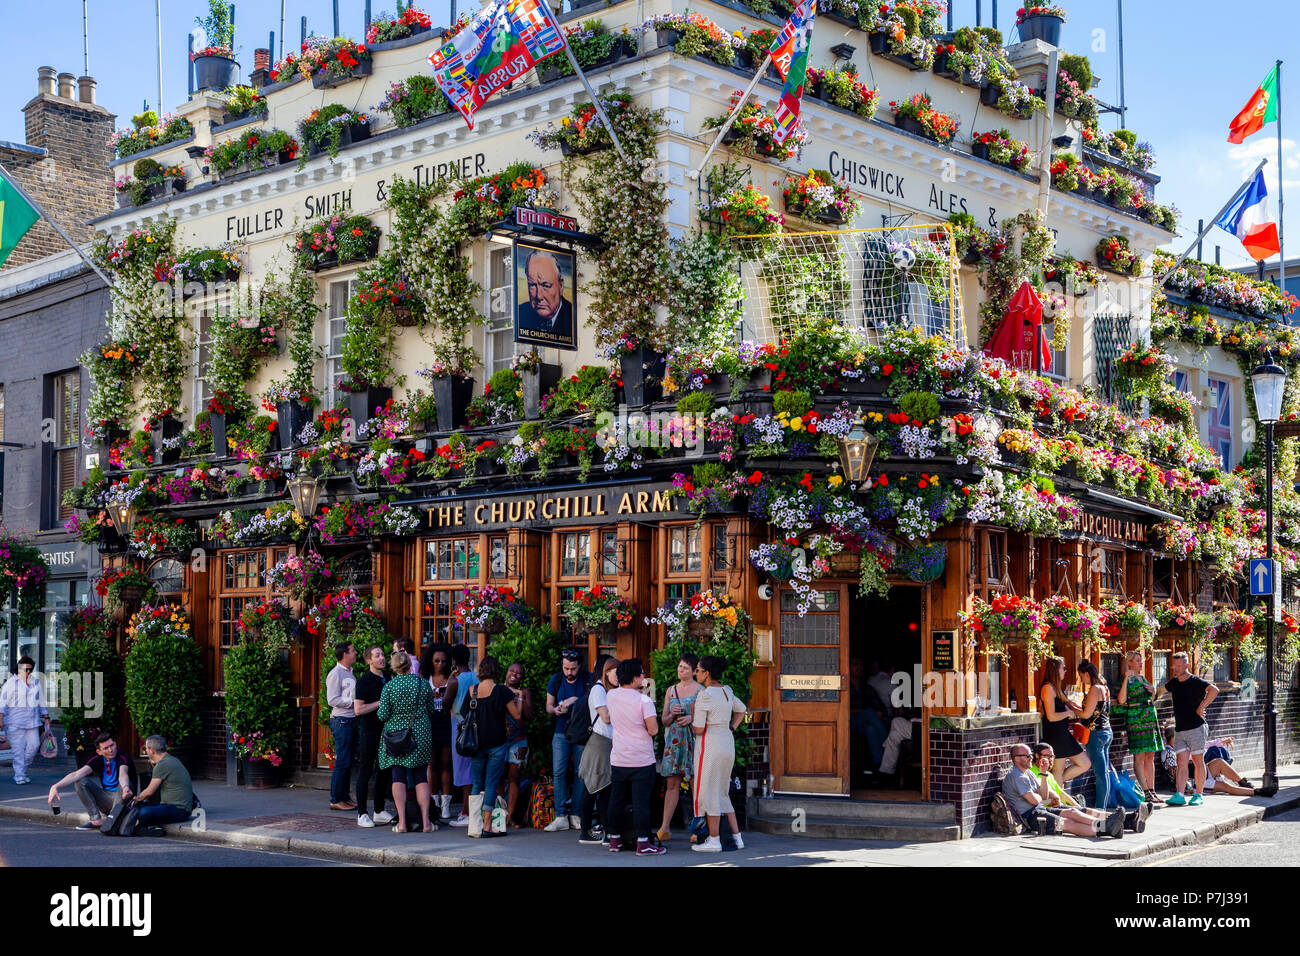 The Churchill Arms Pub, Kensington Church Street, London, United Kingdom - Stock Image